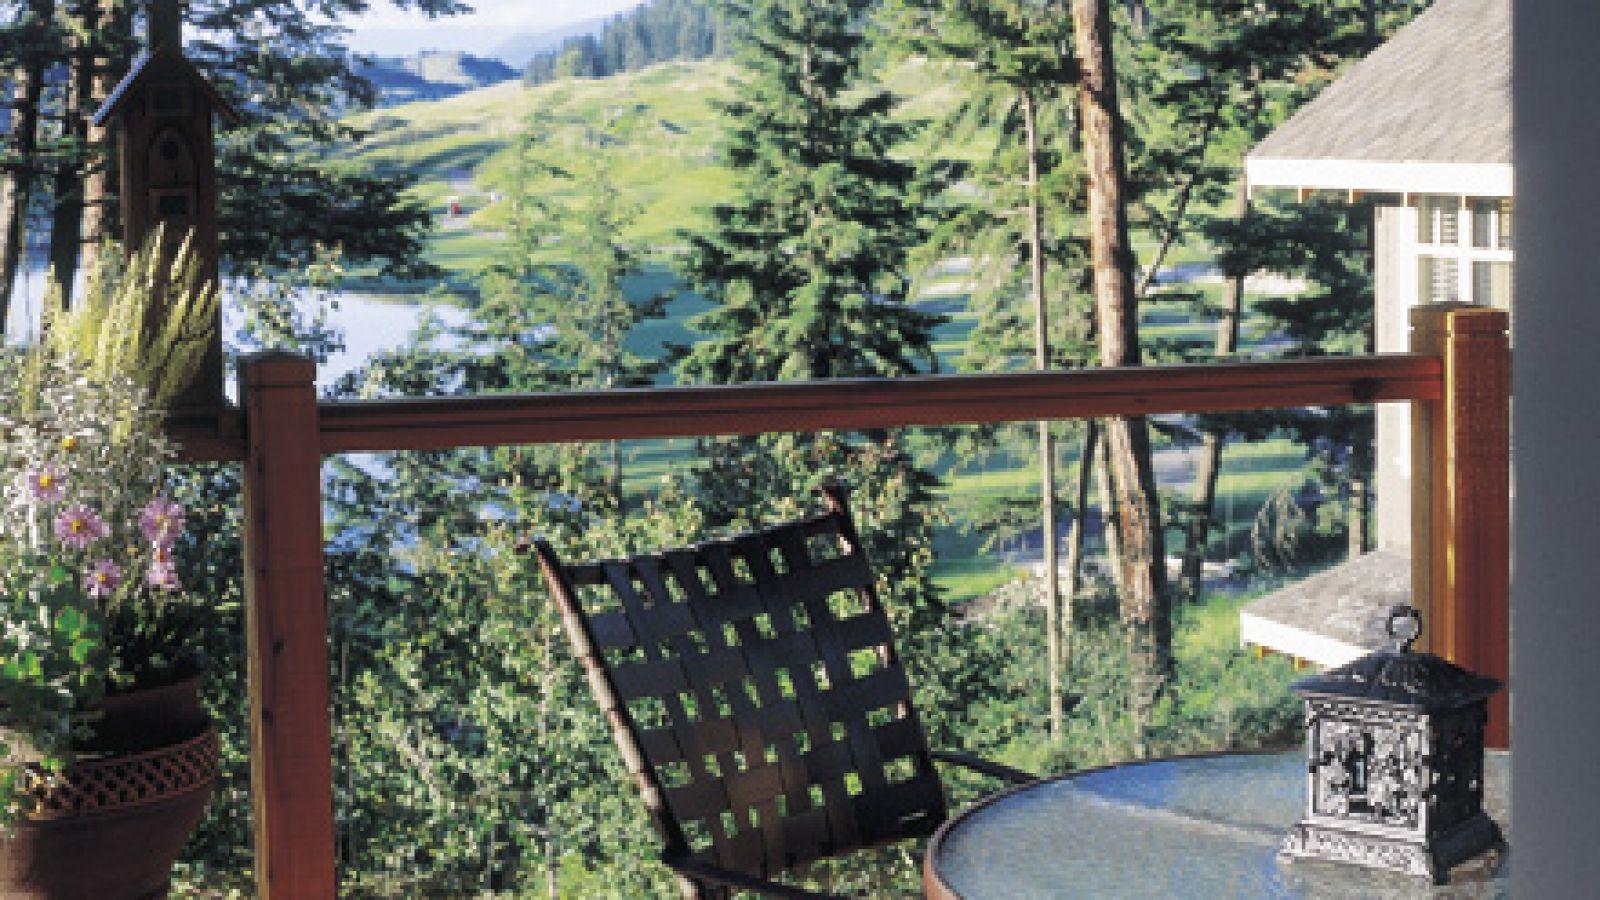 Predator Ridge Resort - Deck and View